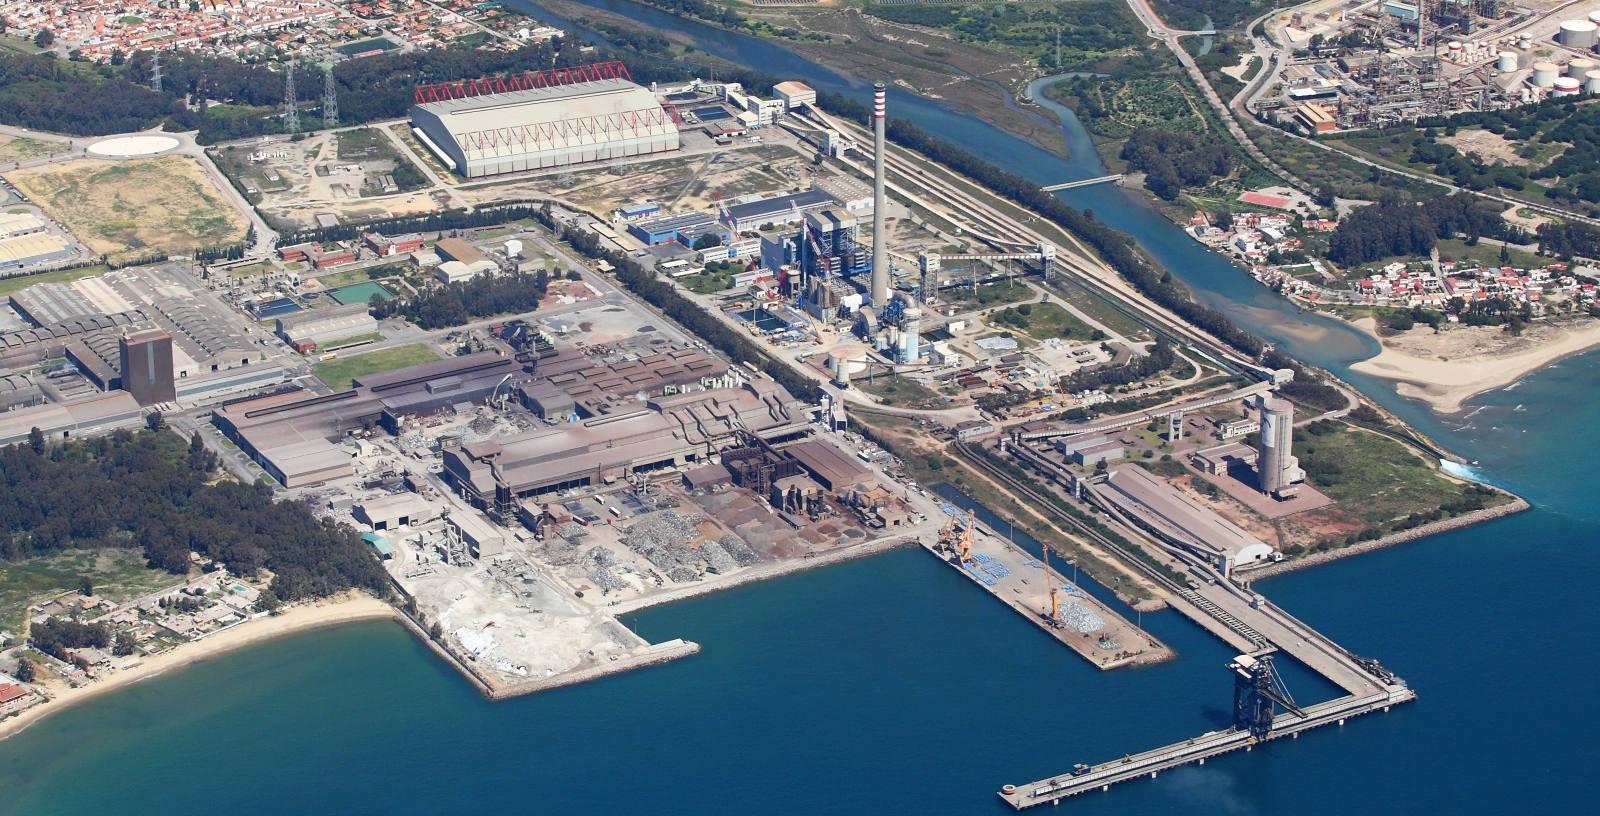 Bunkering_LNG_Spain_Endesa_IDOM_01